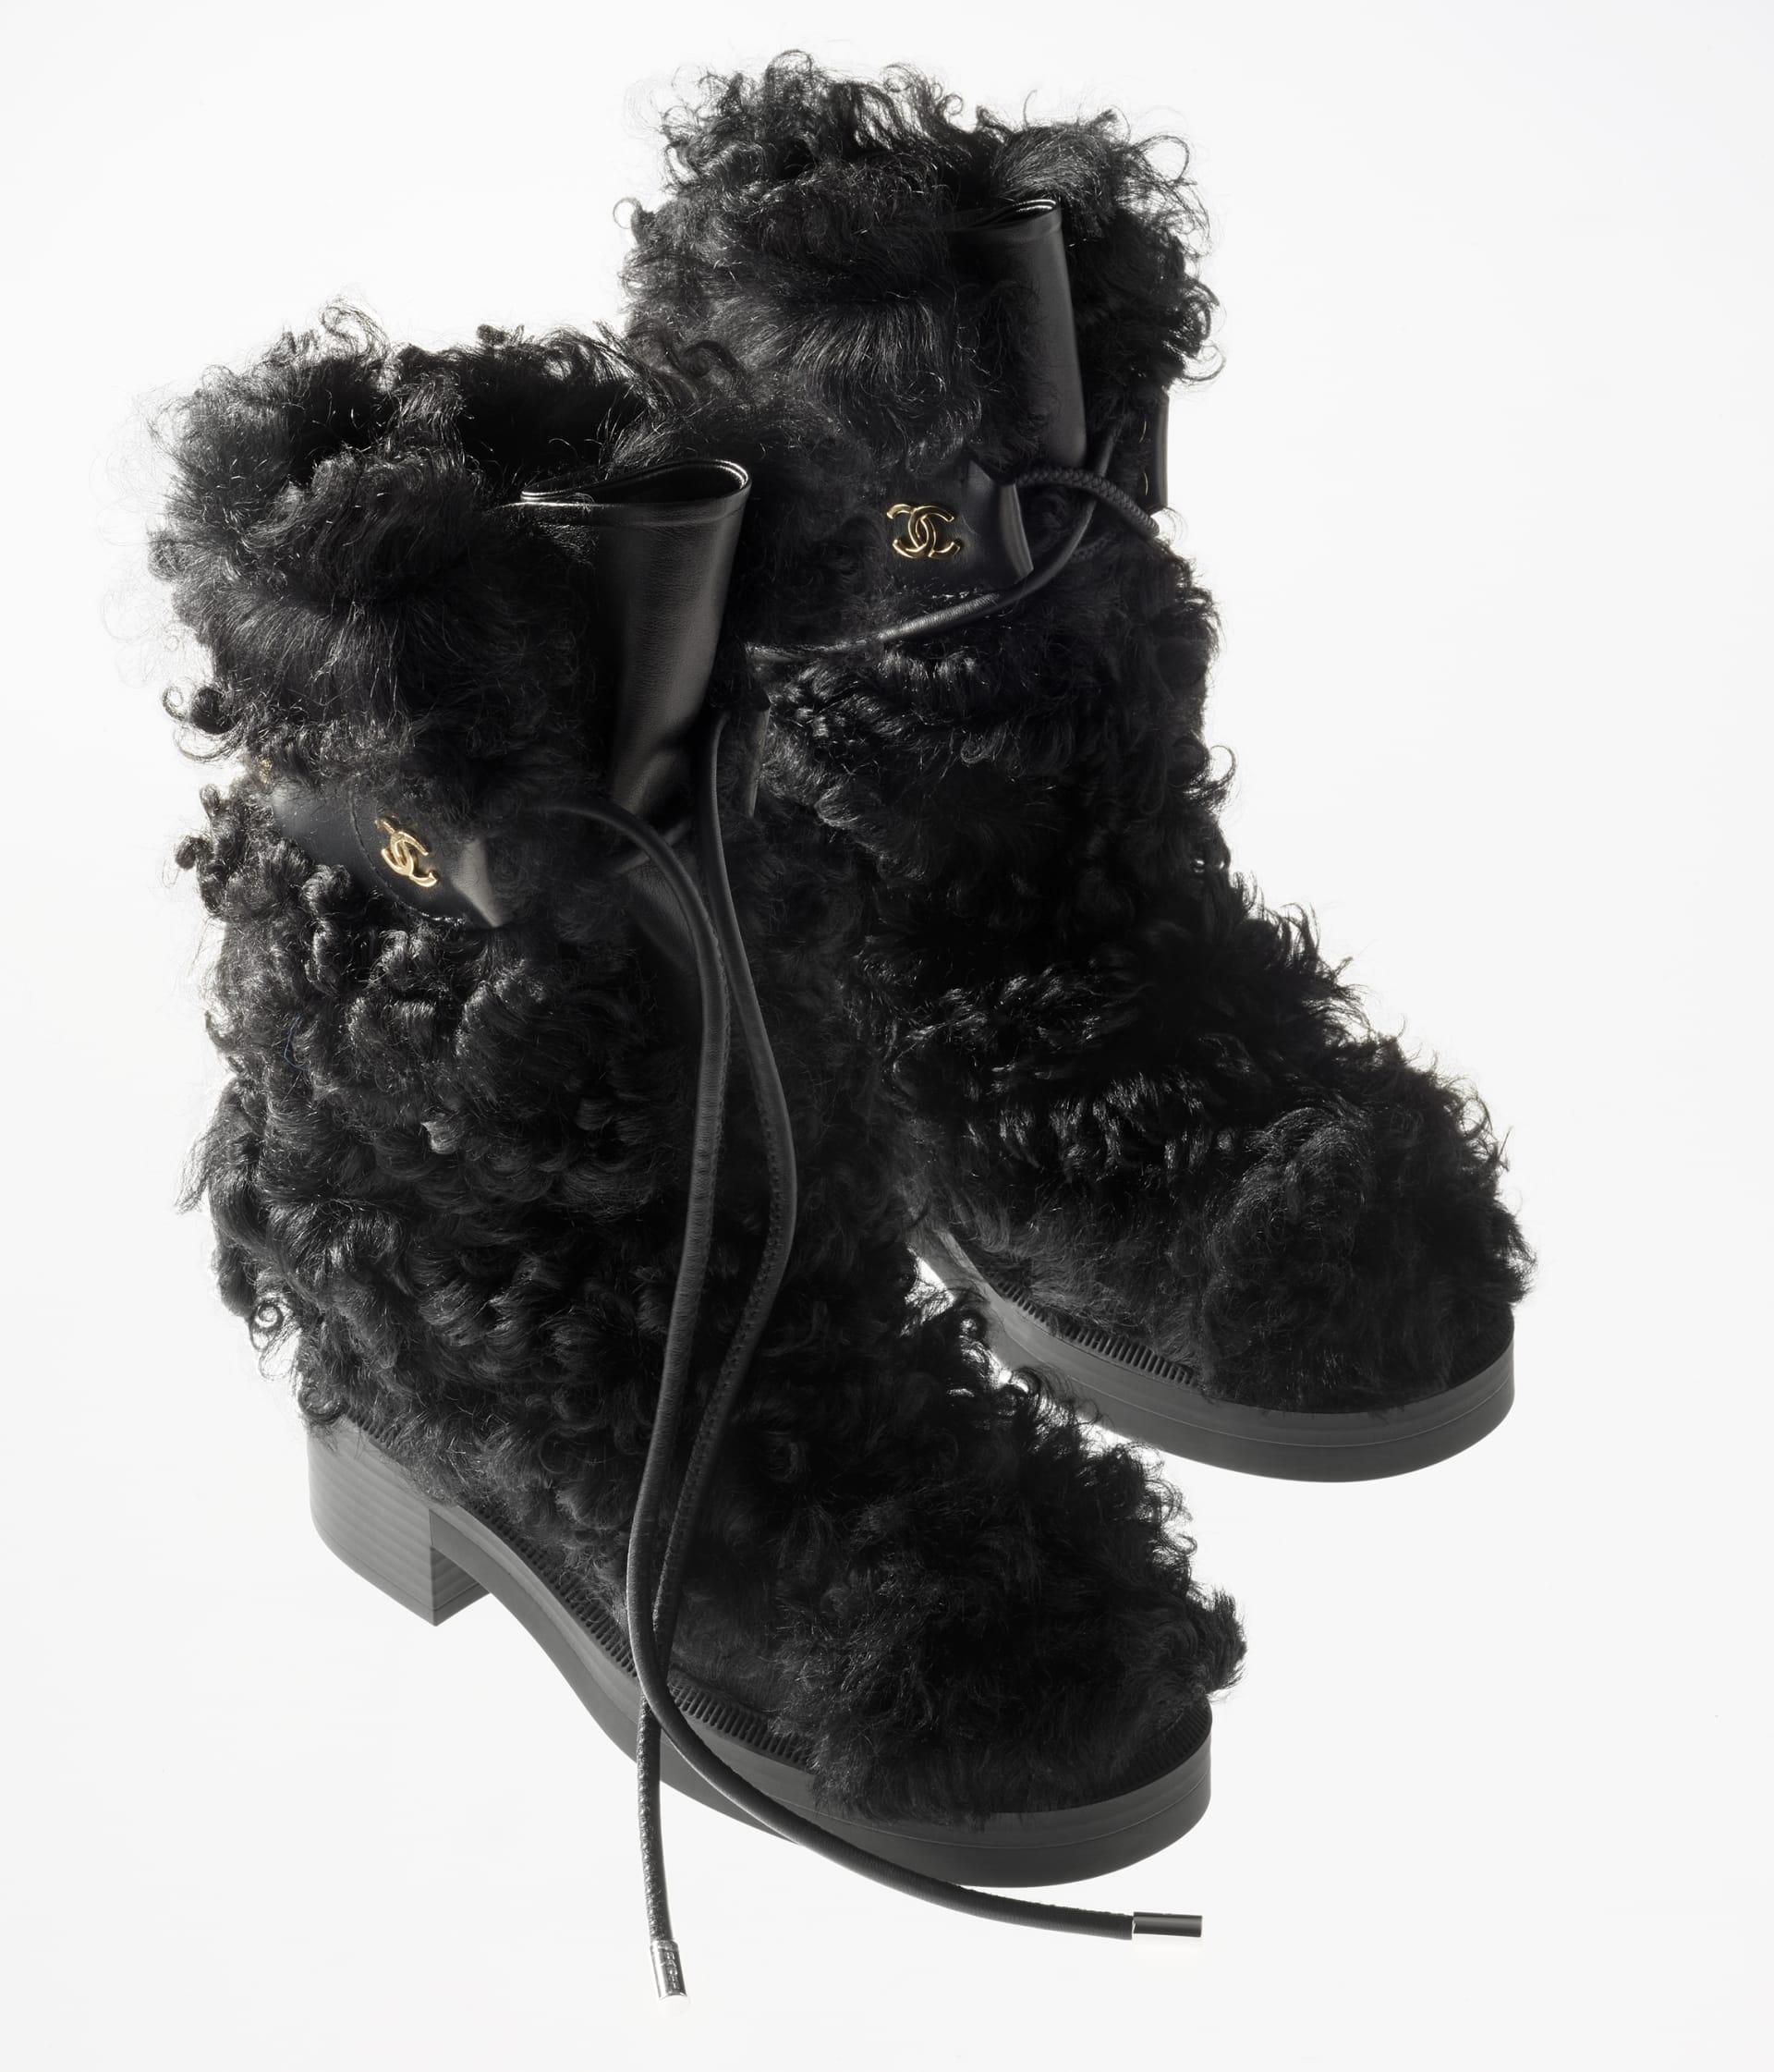 image 2 - High Boots - Shearling Sheepskin - Black